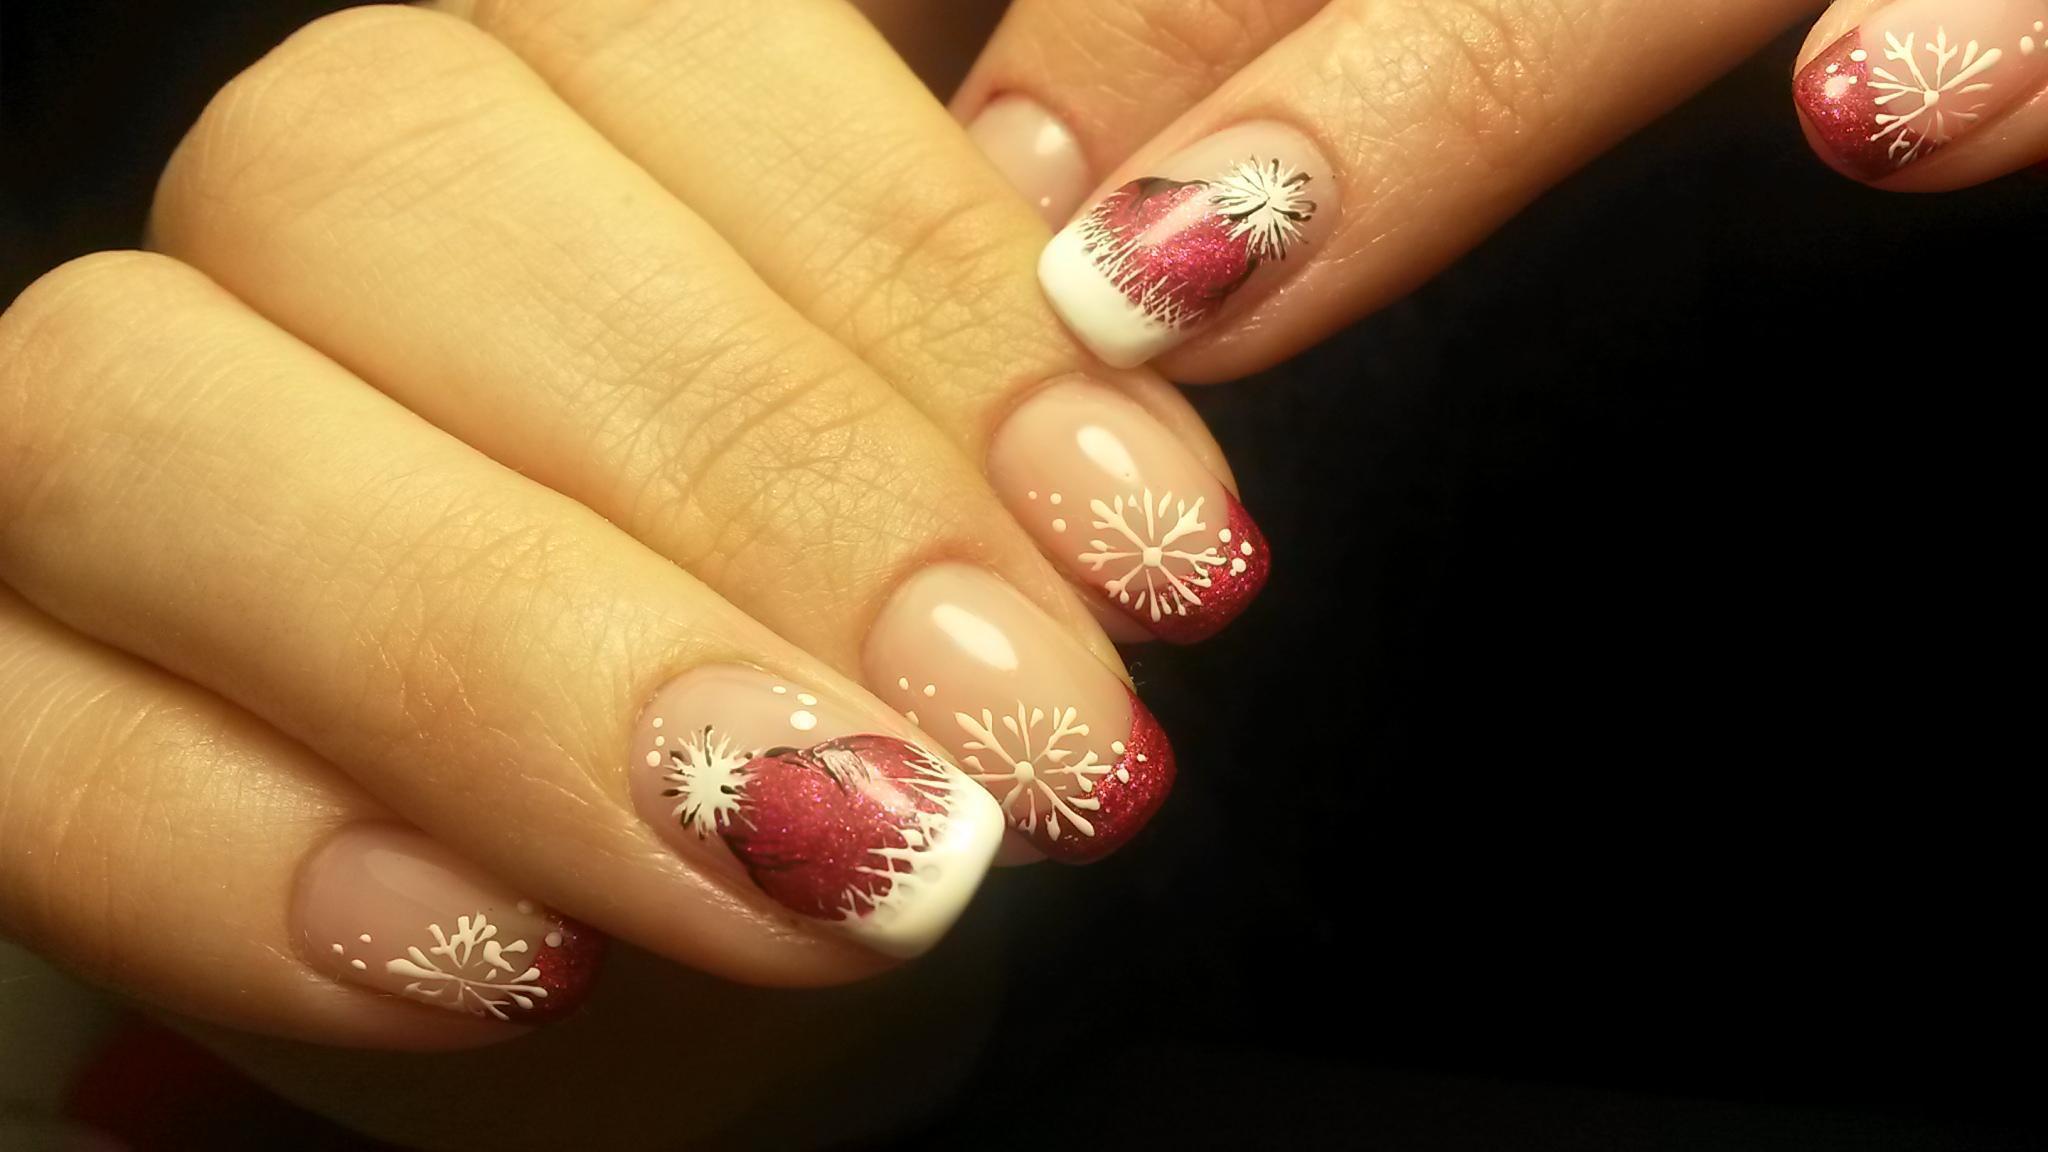 Красивые снежинки ногти фото